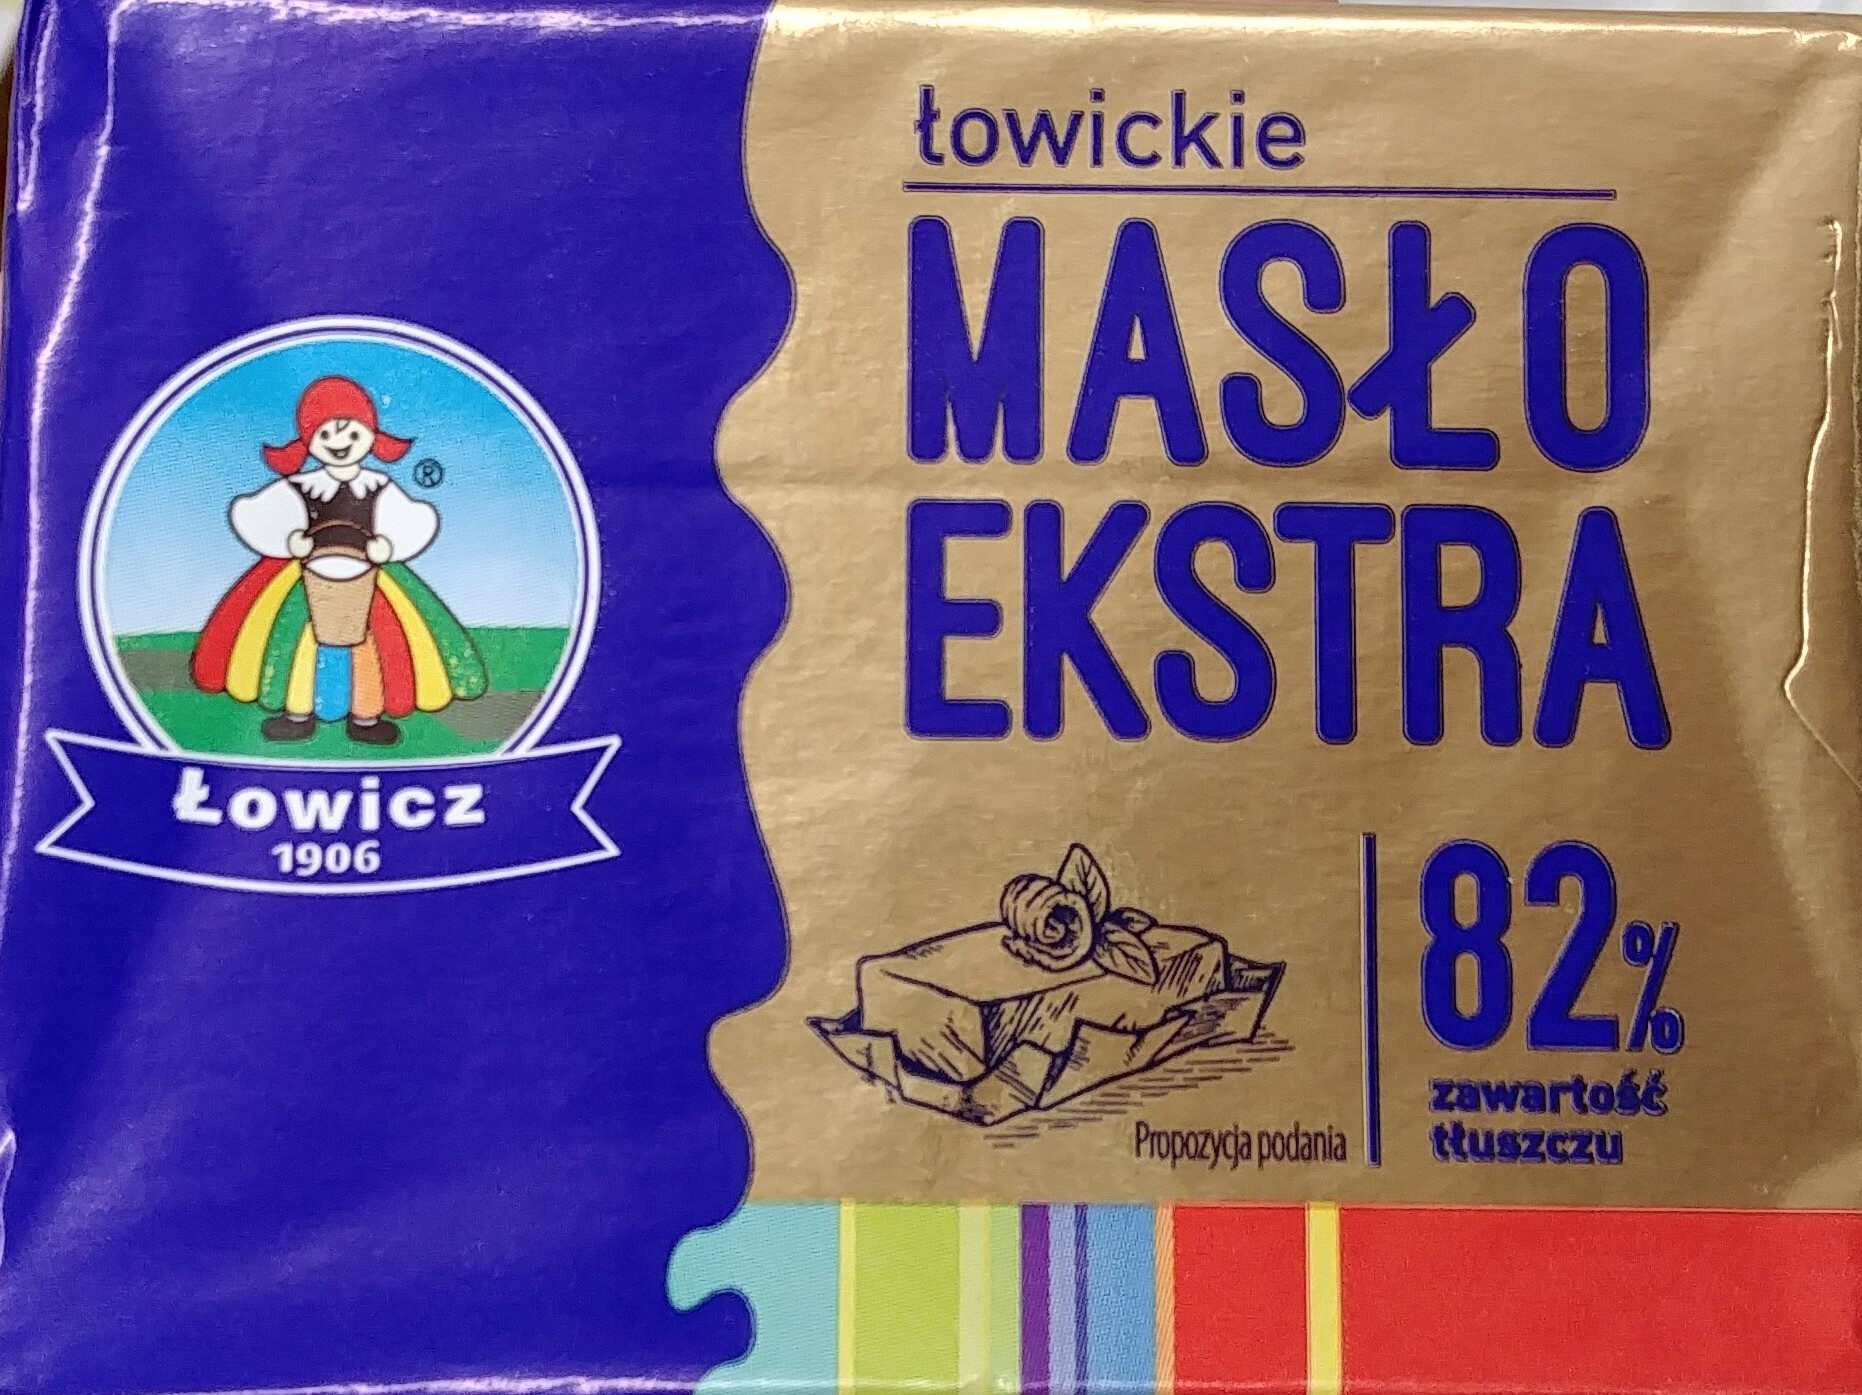 Masło Ekstra 82% - Product - pl